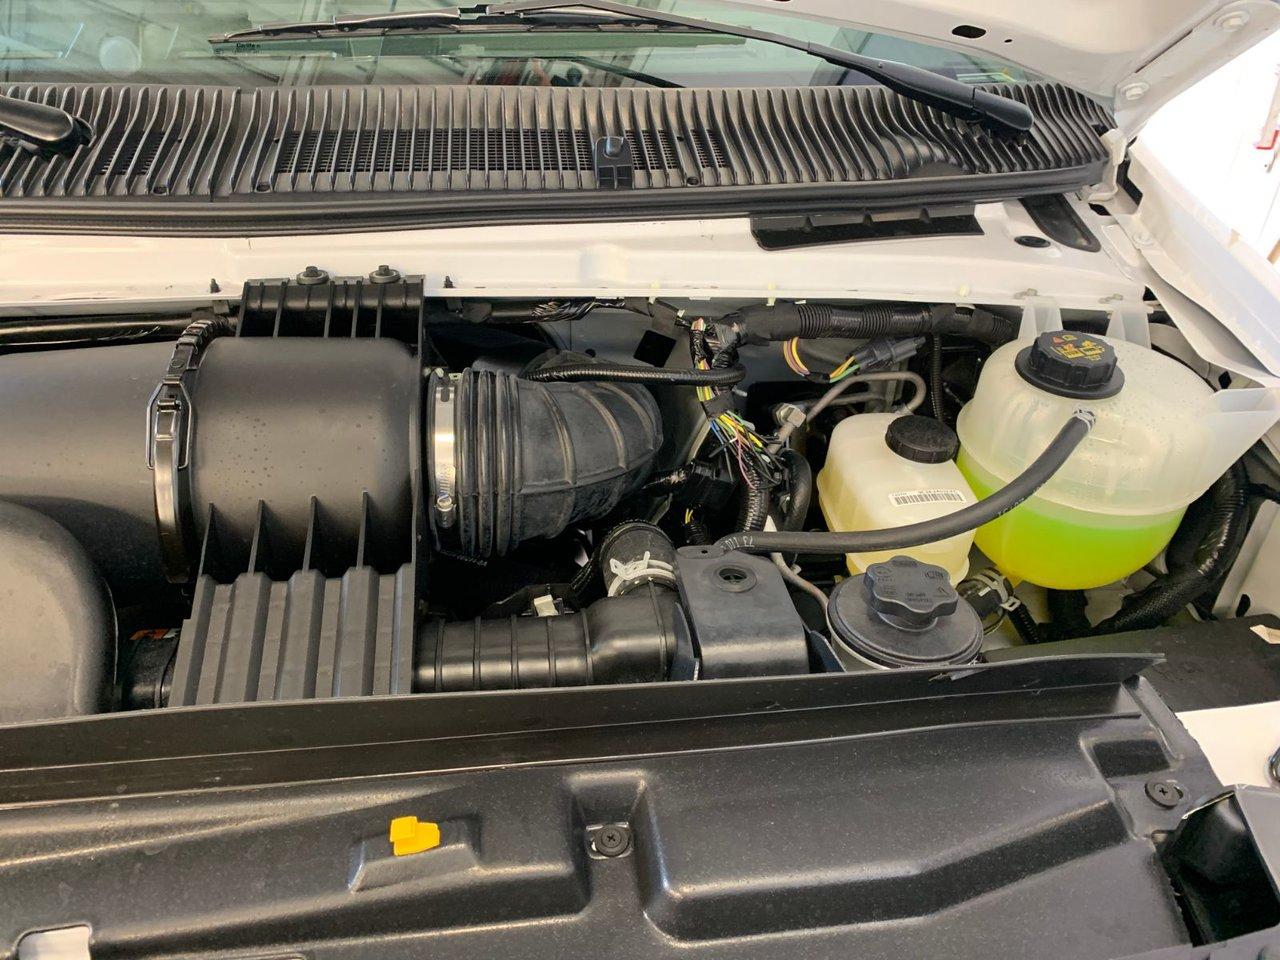 2019 Ford E-Series Cutaway E-450 CUBE 16 PIEDS